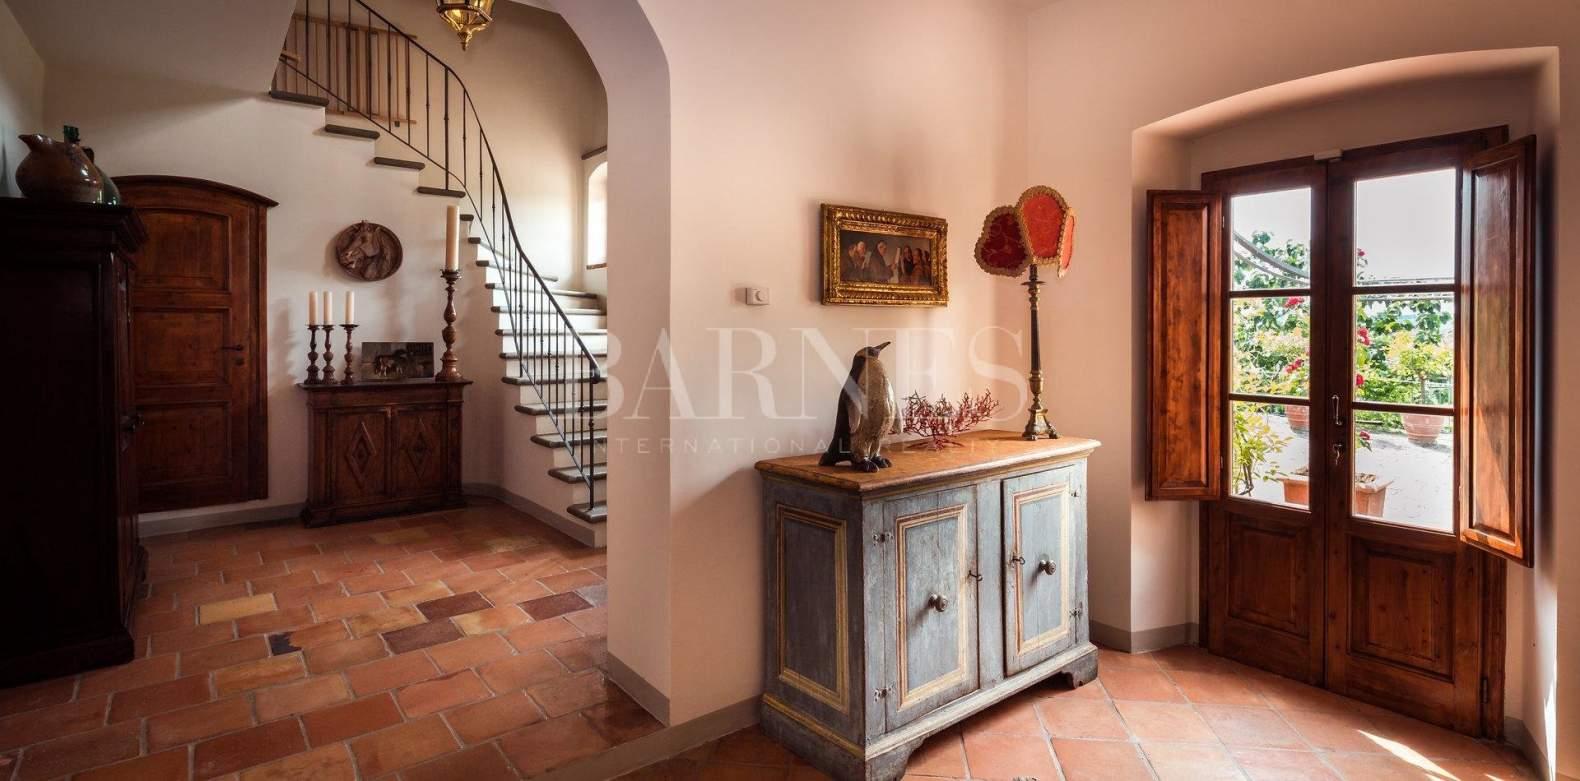 Barberino Tavarnelle  - Villa 10 Cuartos 9 Habitaciones - picture 12